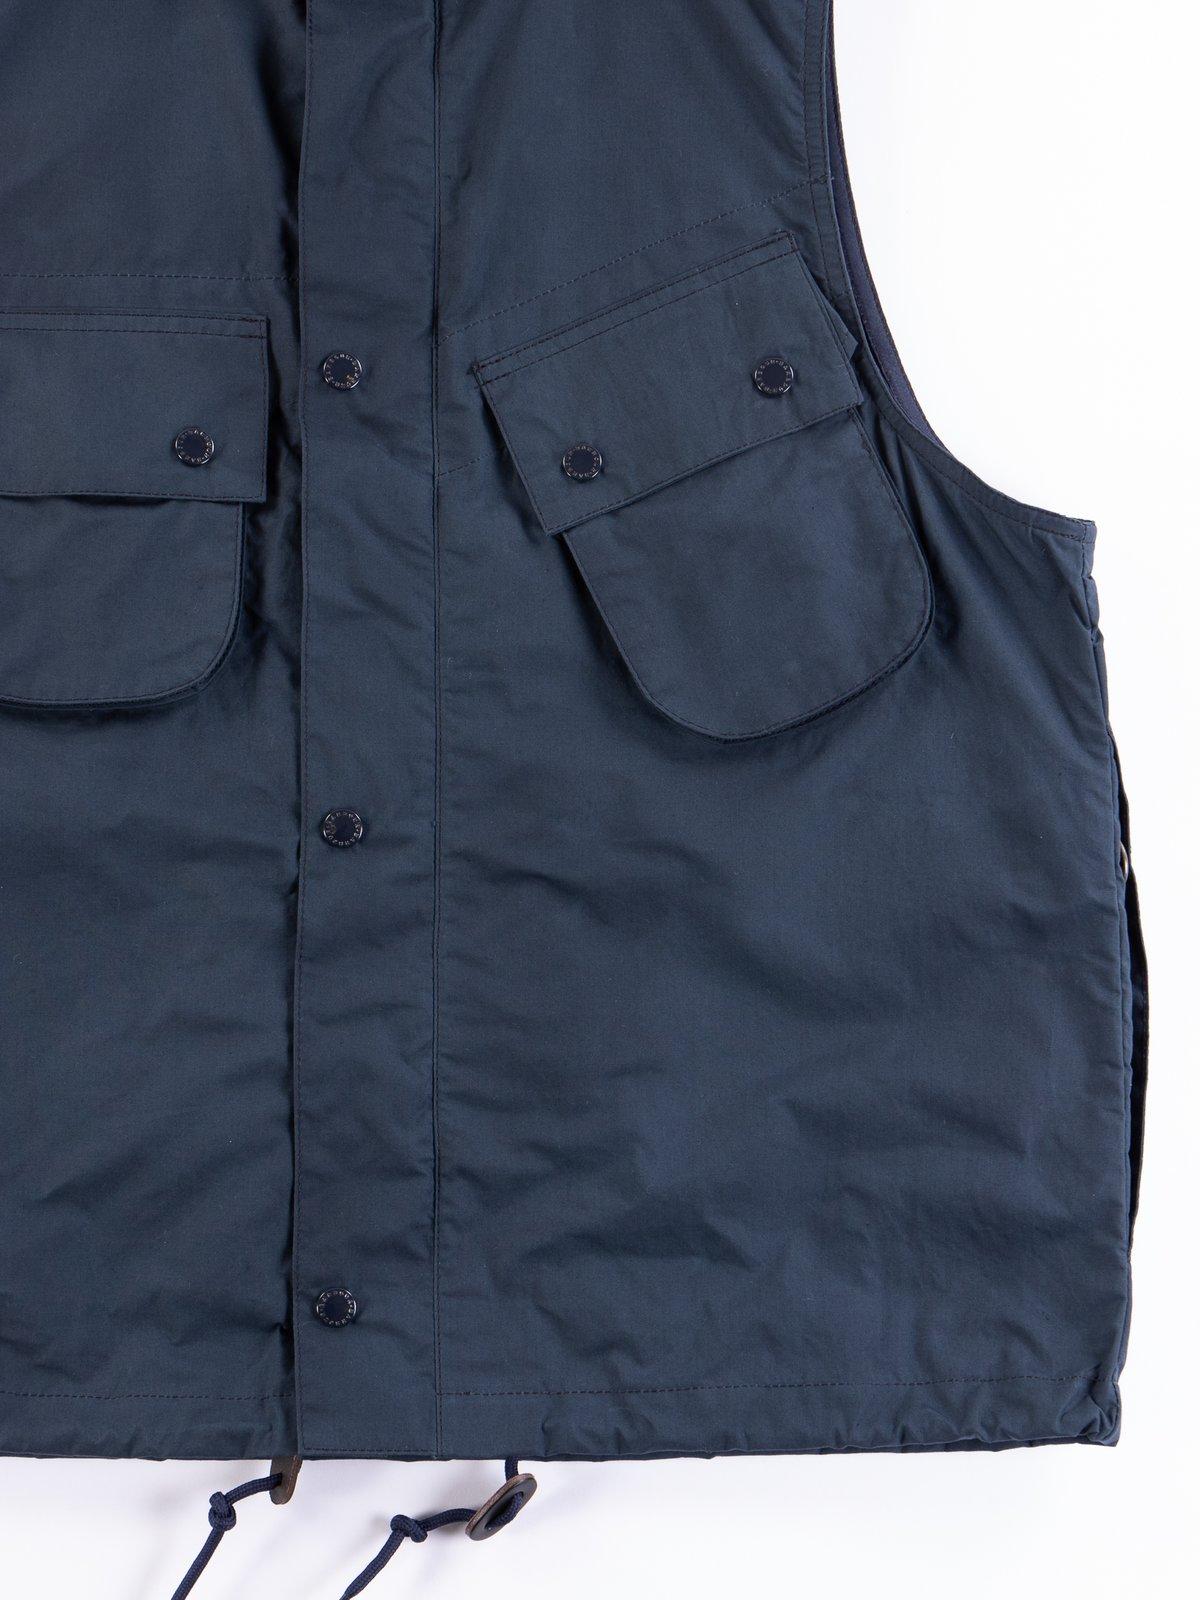 Navy Arthur Vest - Image 4